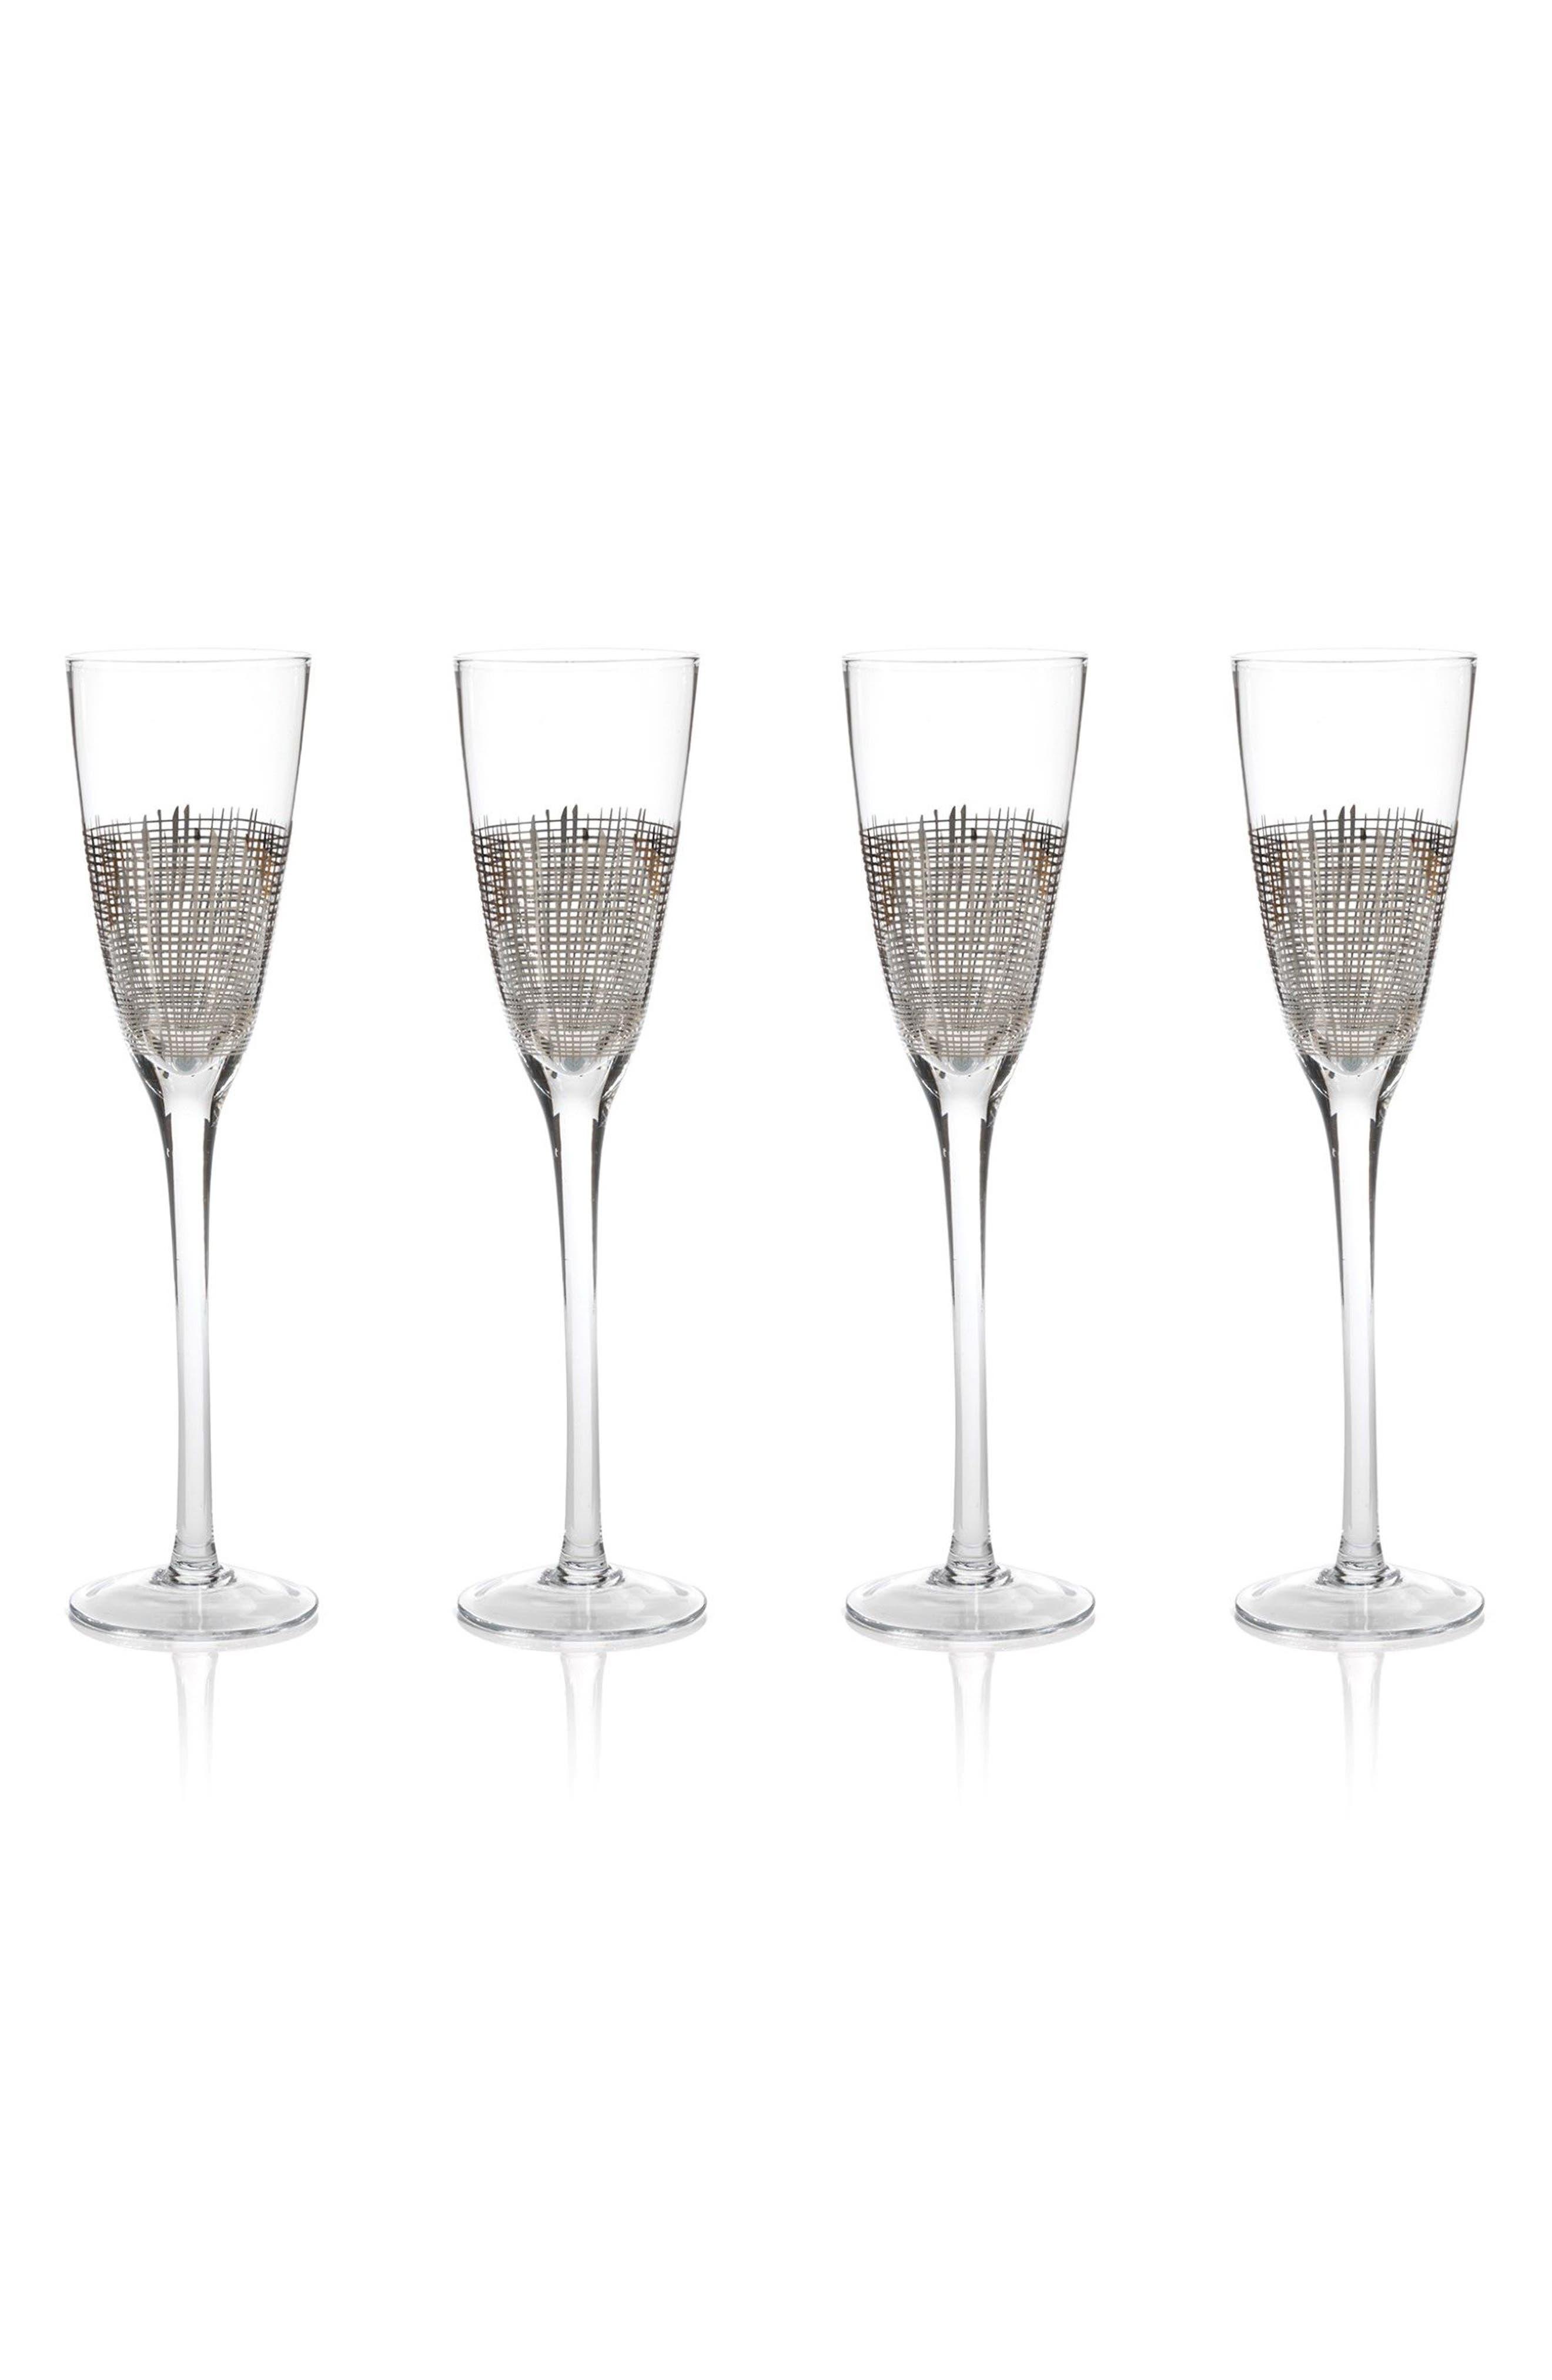 Reza Set of 4 Champagne Flutes,                             Main thumbnail 1, color,                             040